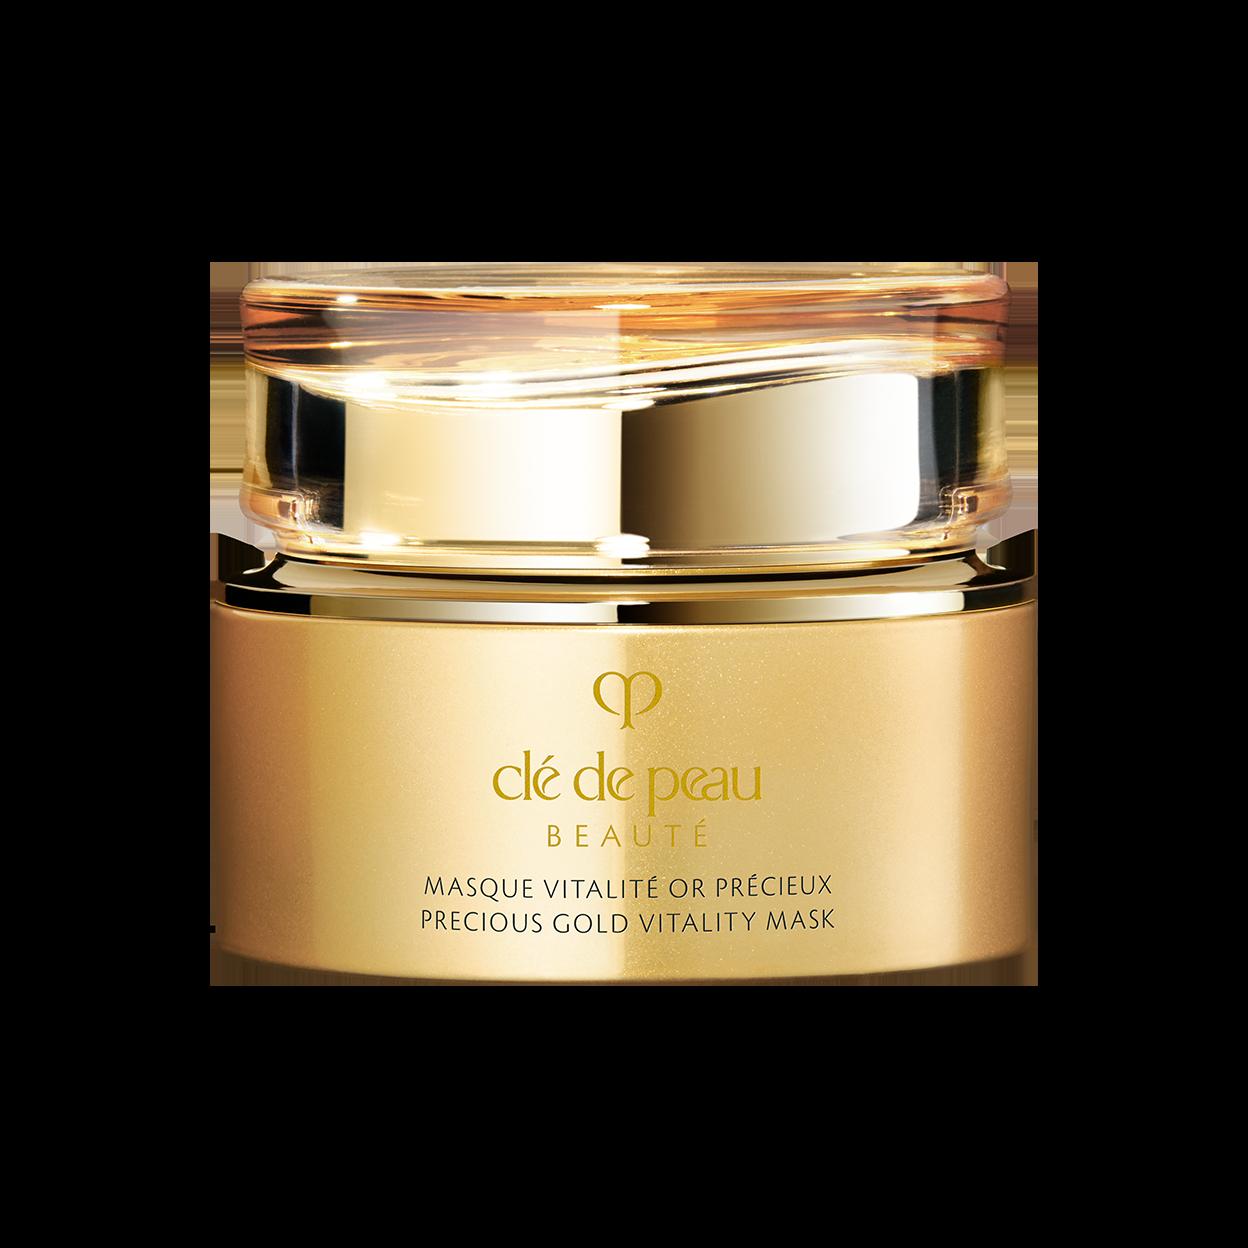 Cle De Peau Beaute Precious Gold Vitality Mask